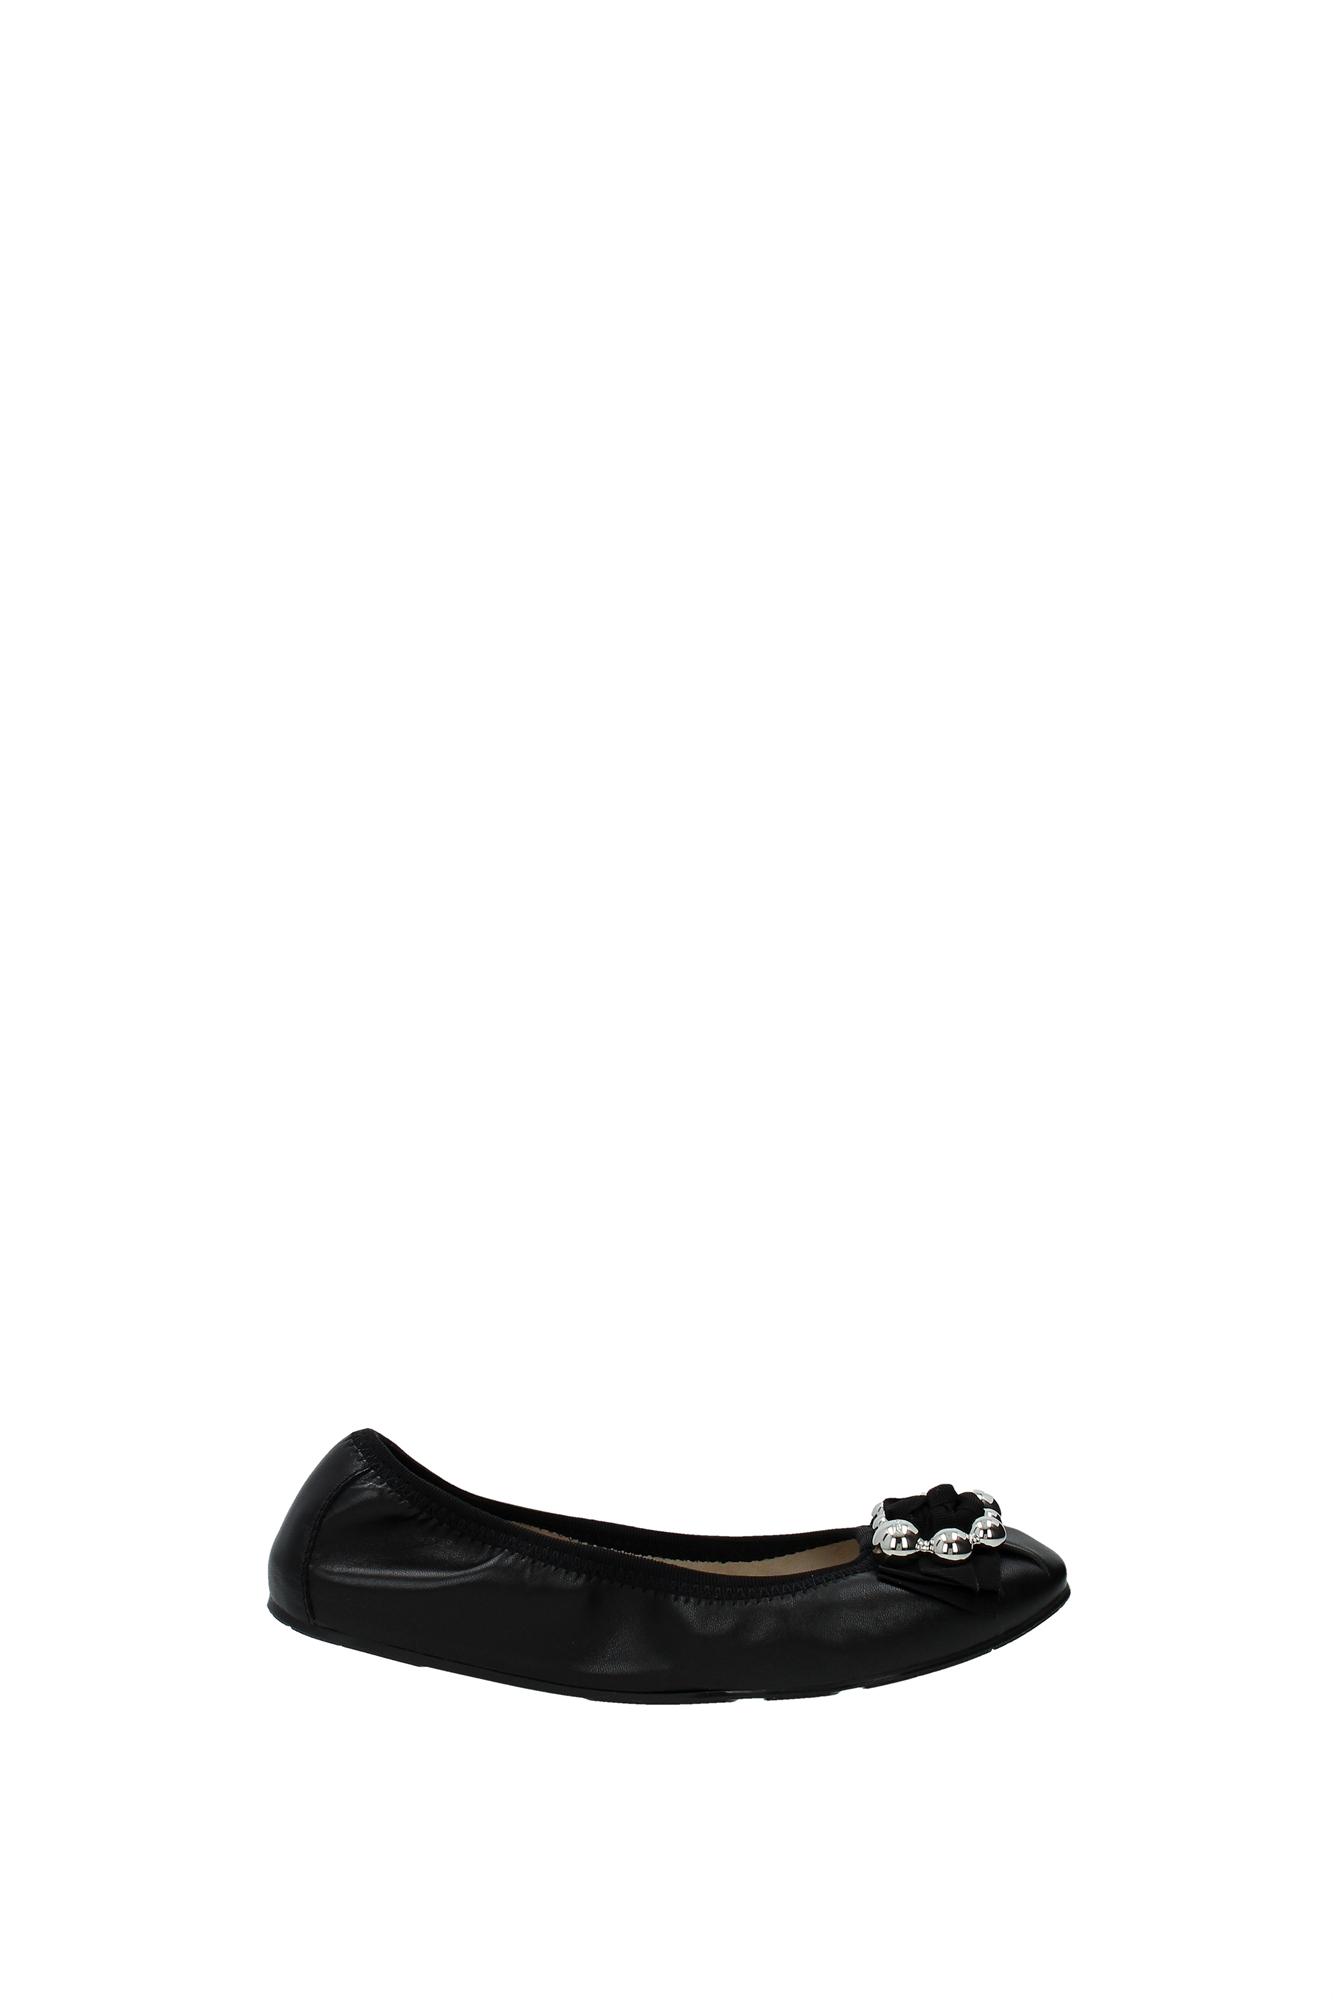 ... Ballet Flats Salvatore Ferragamo Women Leather Black FIFFY0644780NE RO